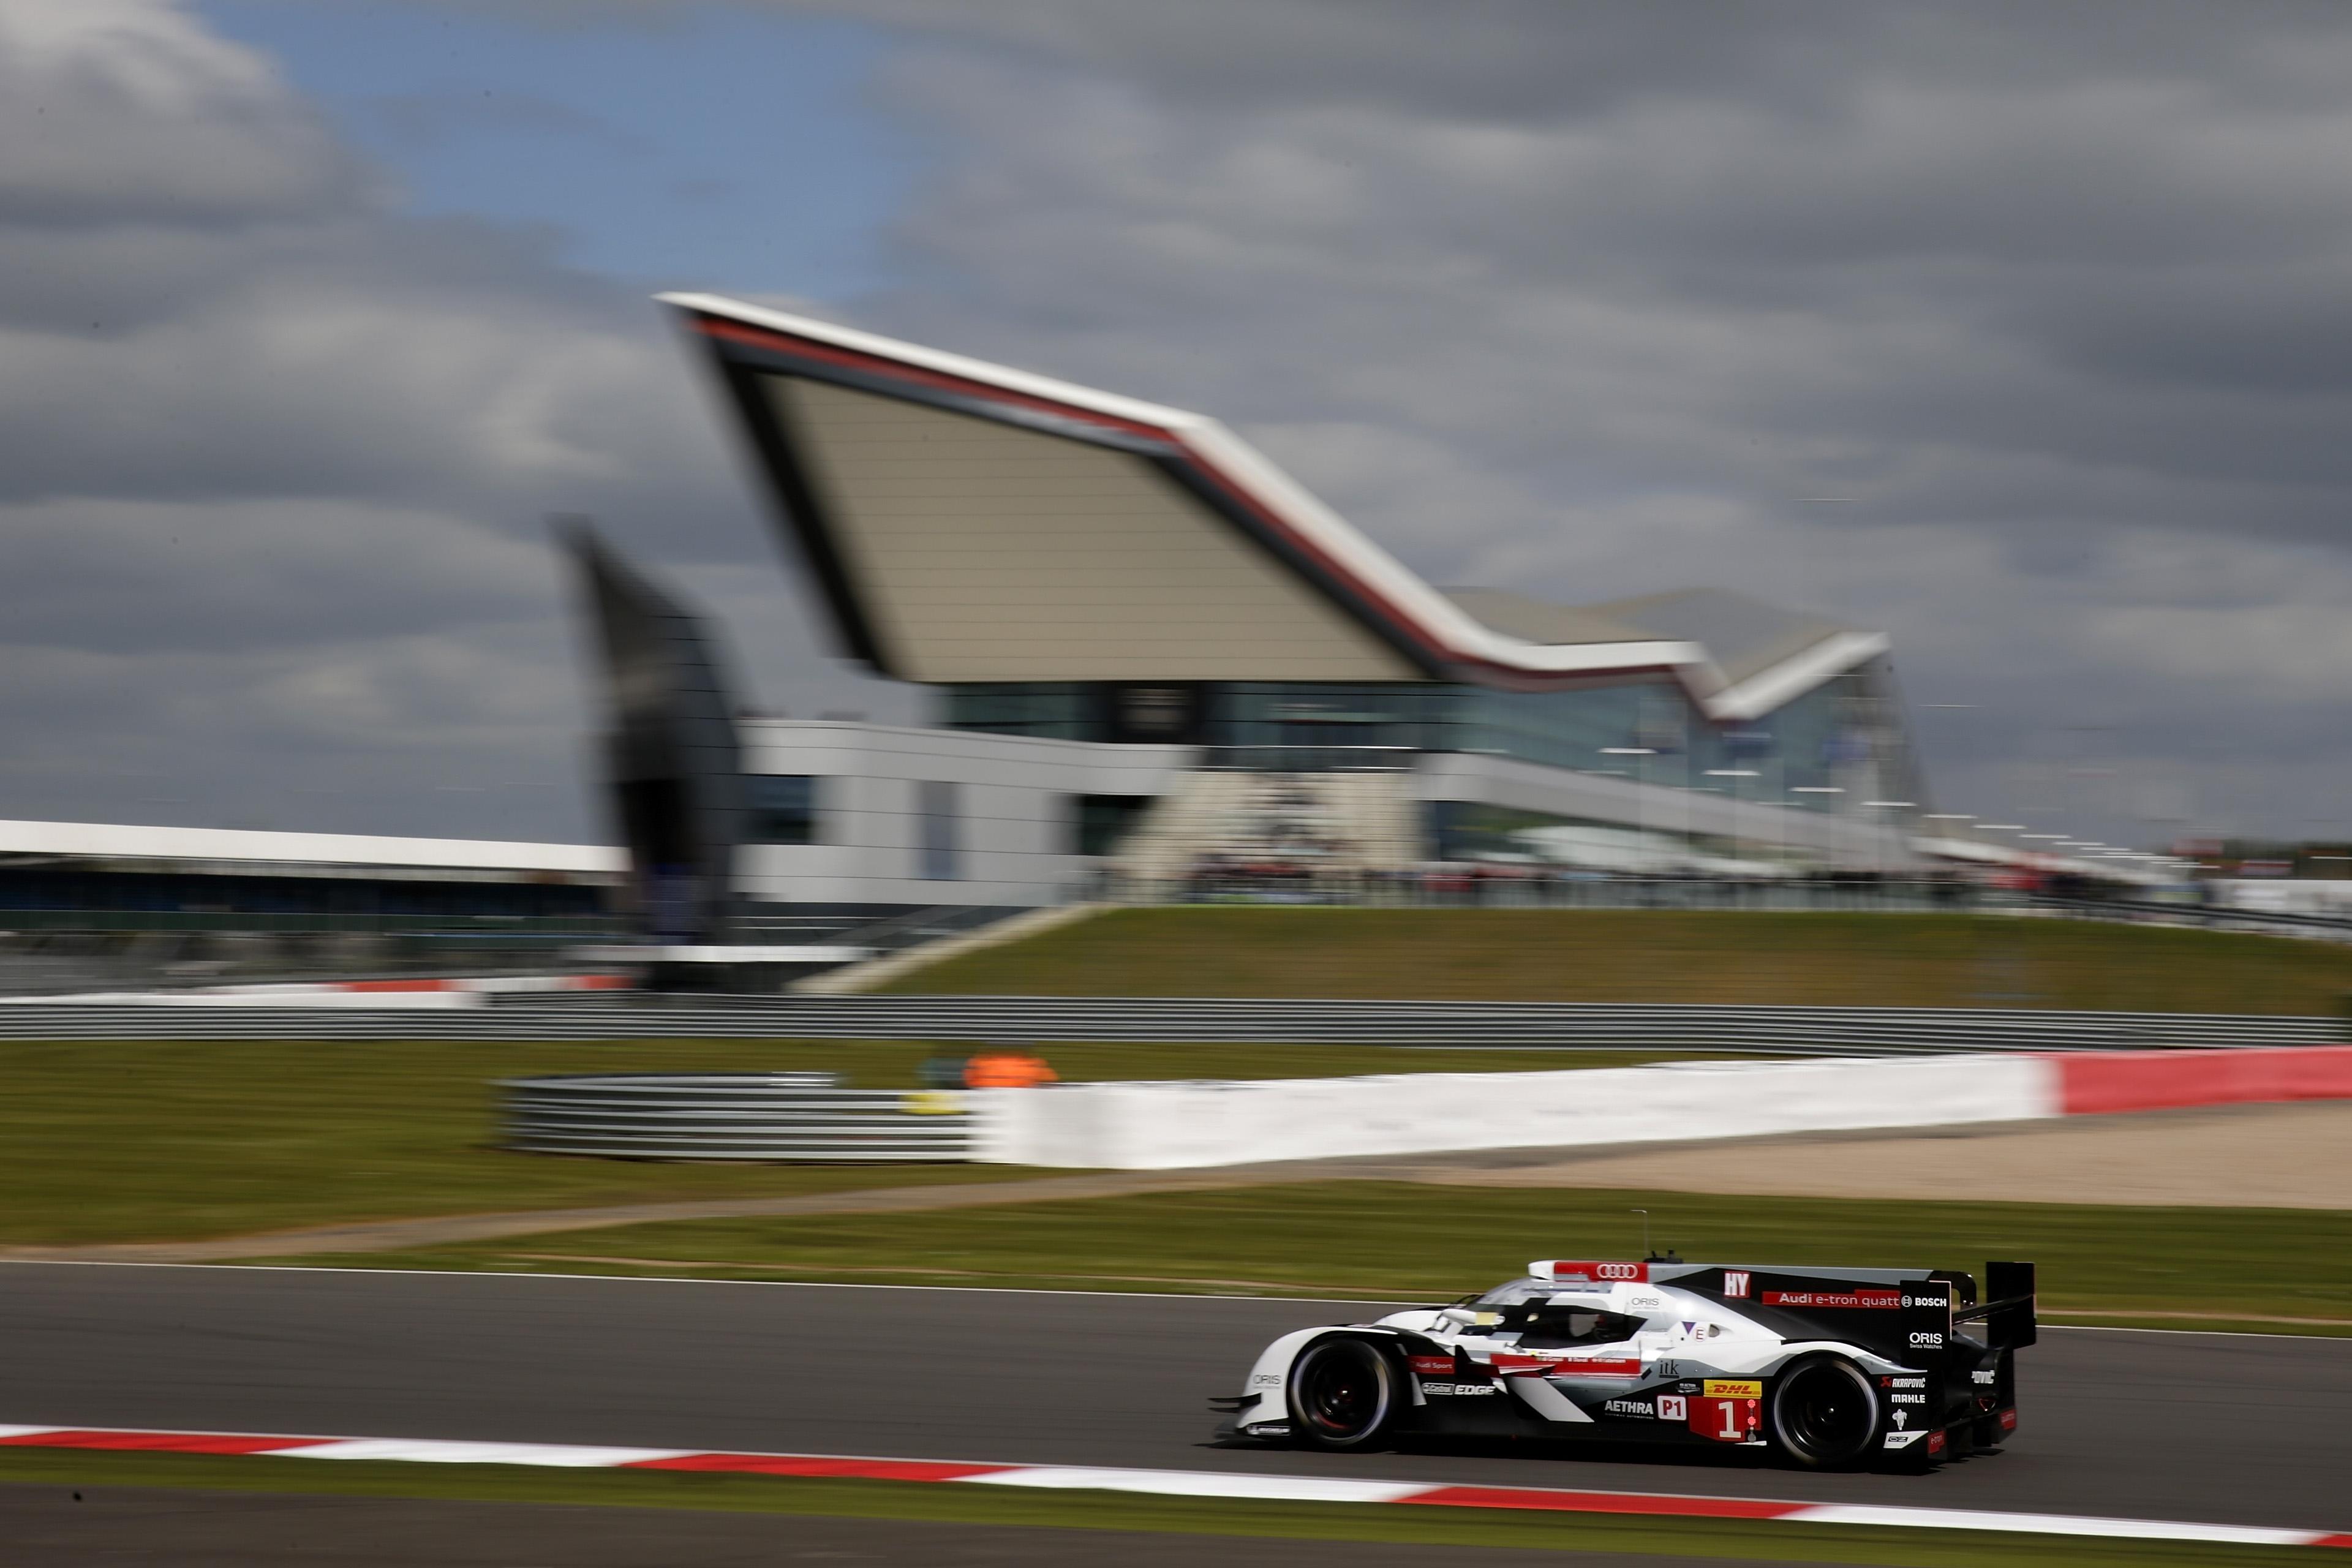 WEC 6 Hours of Silverstone 2014 - Audi #1 - Audi Sport